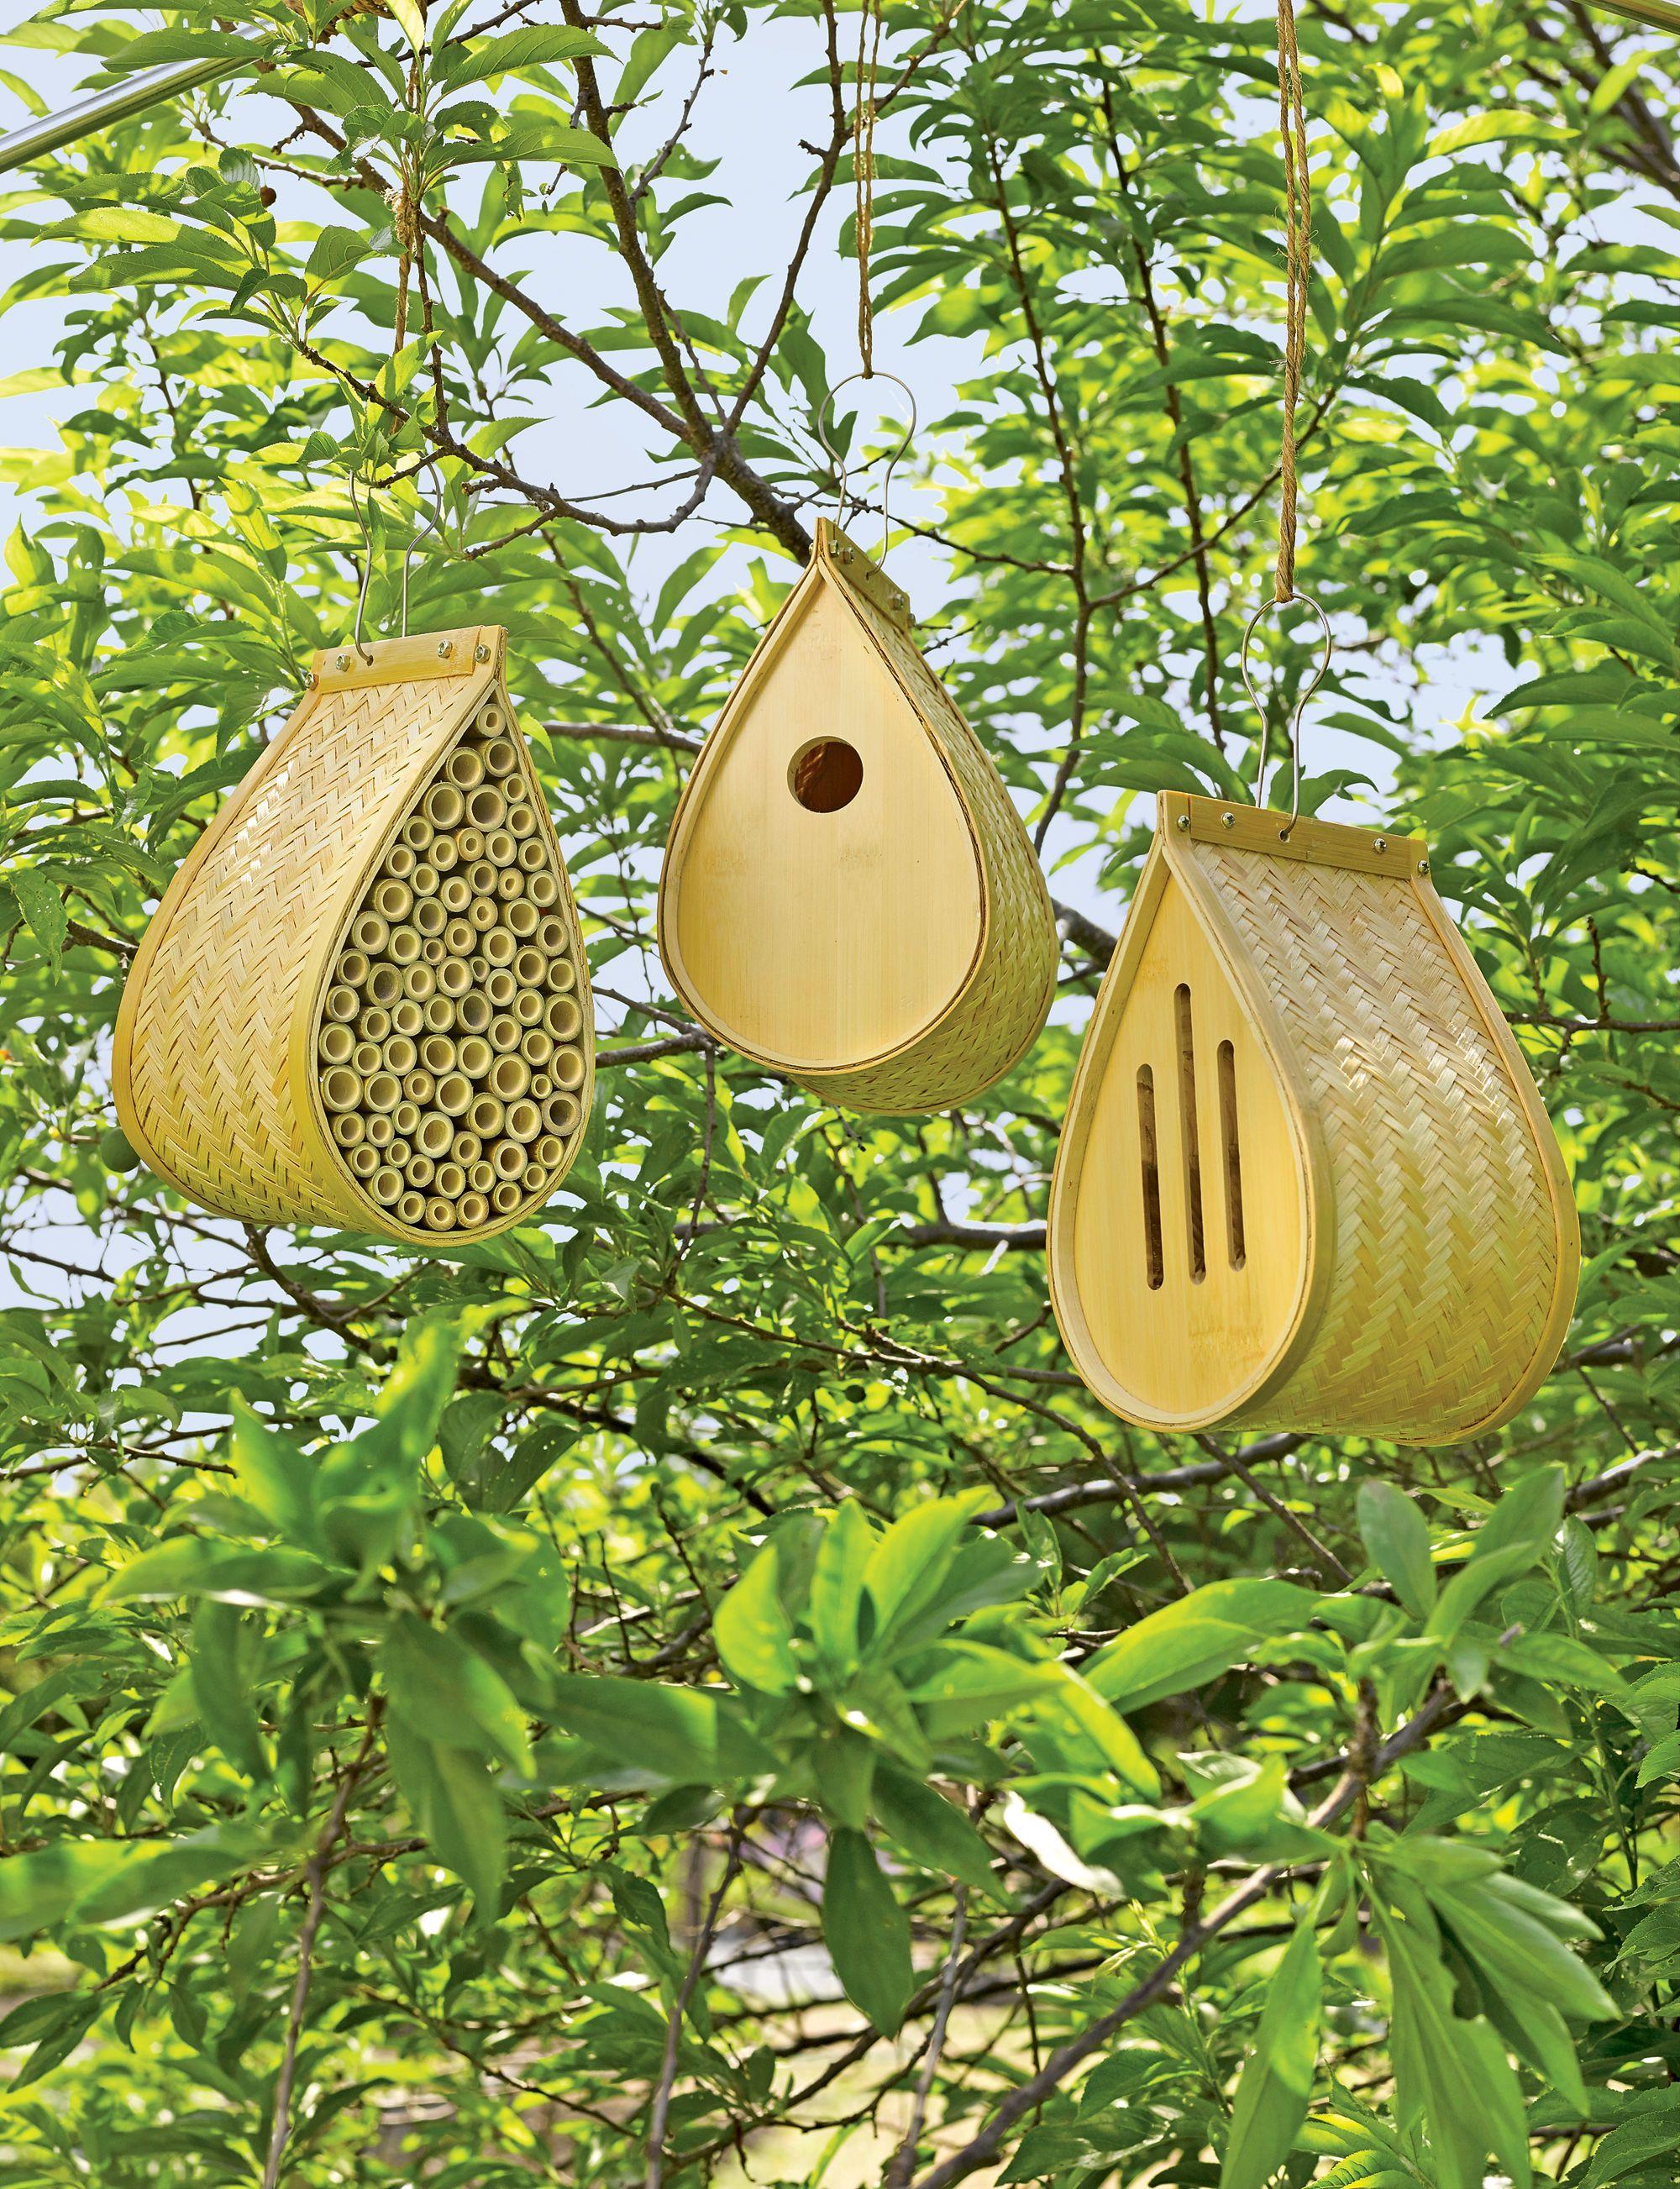 Bamboo habitat collection for butterflies songbirds